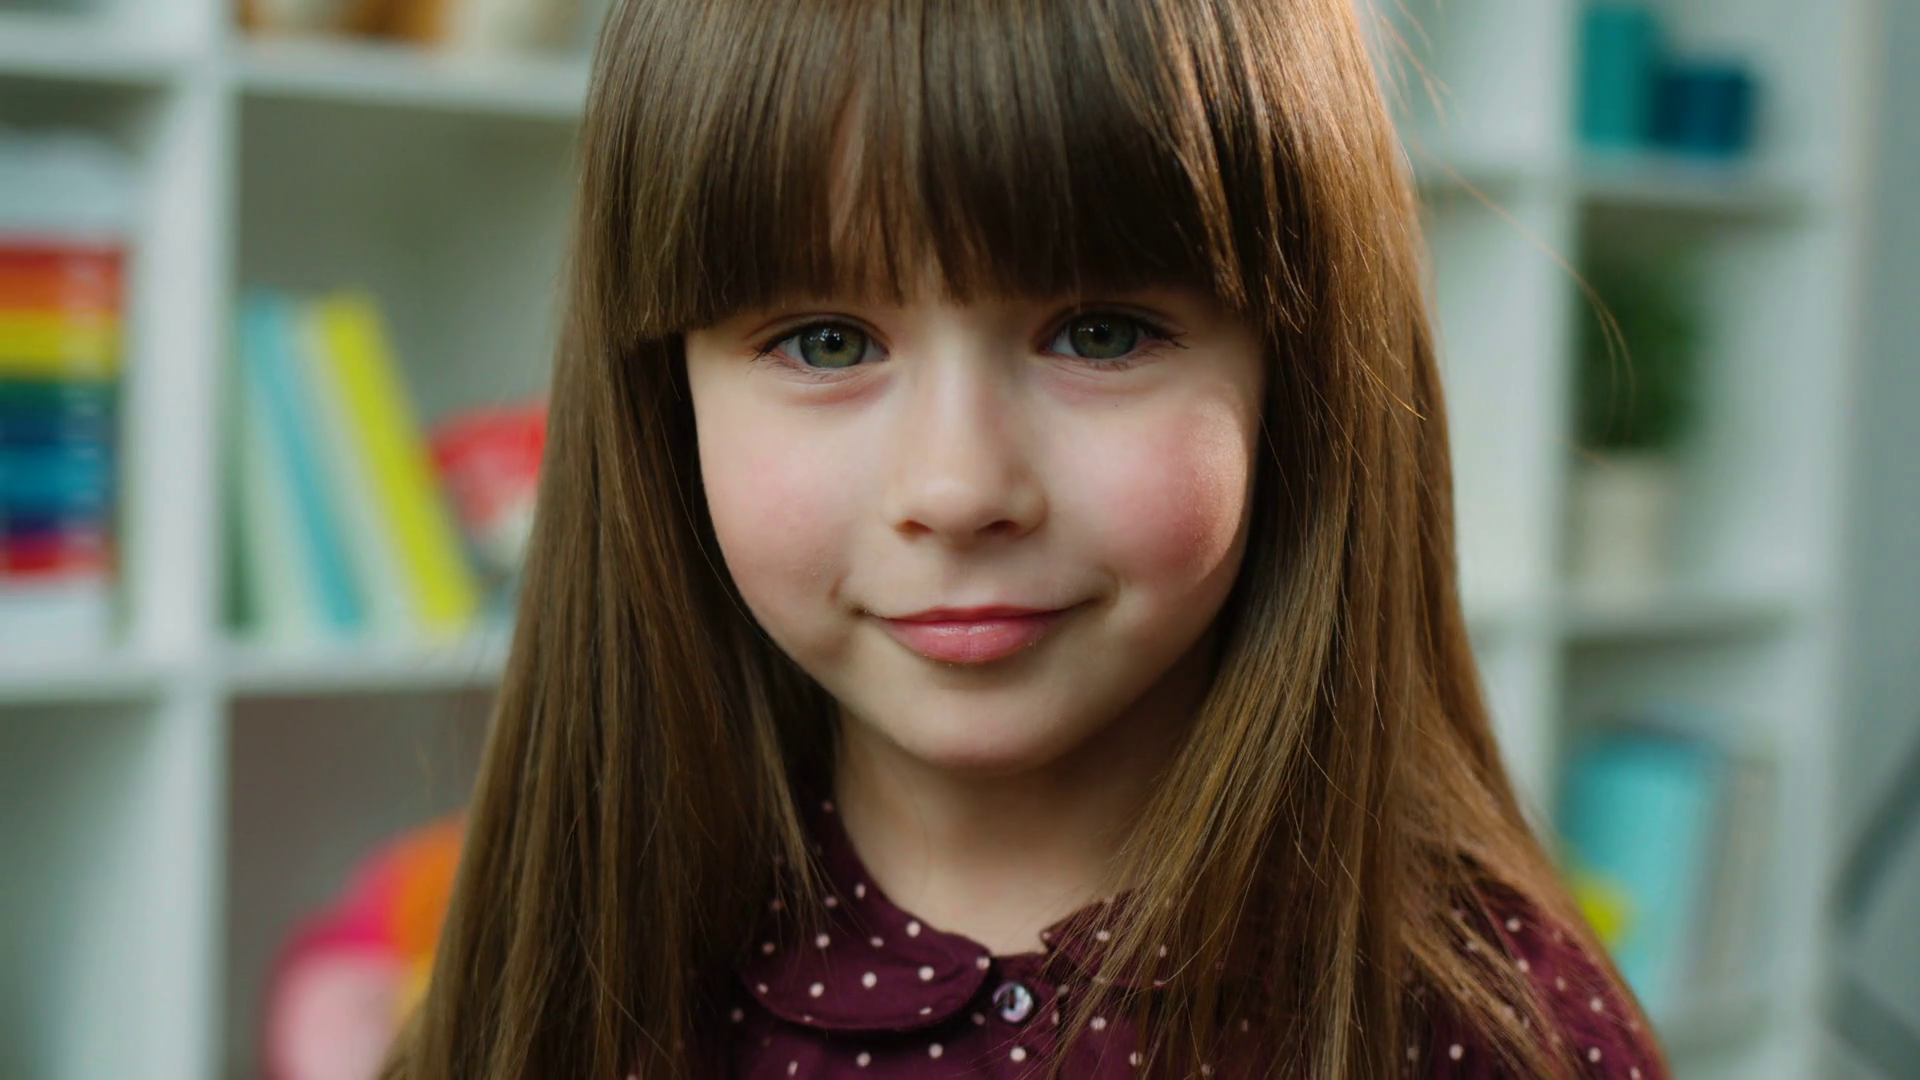 Beautiful Little Girl Hanging Upside Down Stock Photo